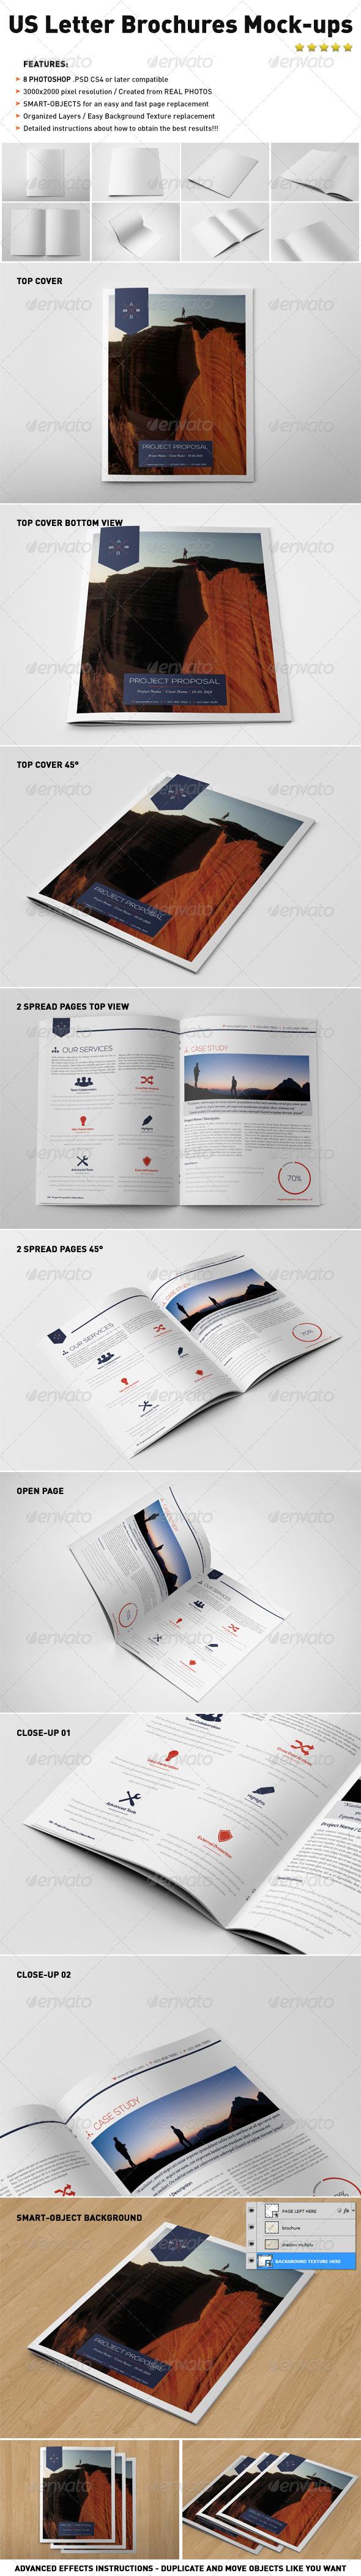 Photorealistic US Letter Brochure Mock-Ups - Brochures Print